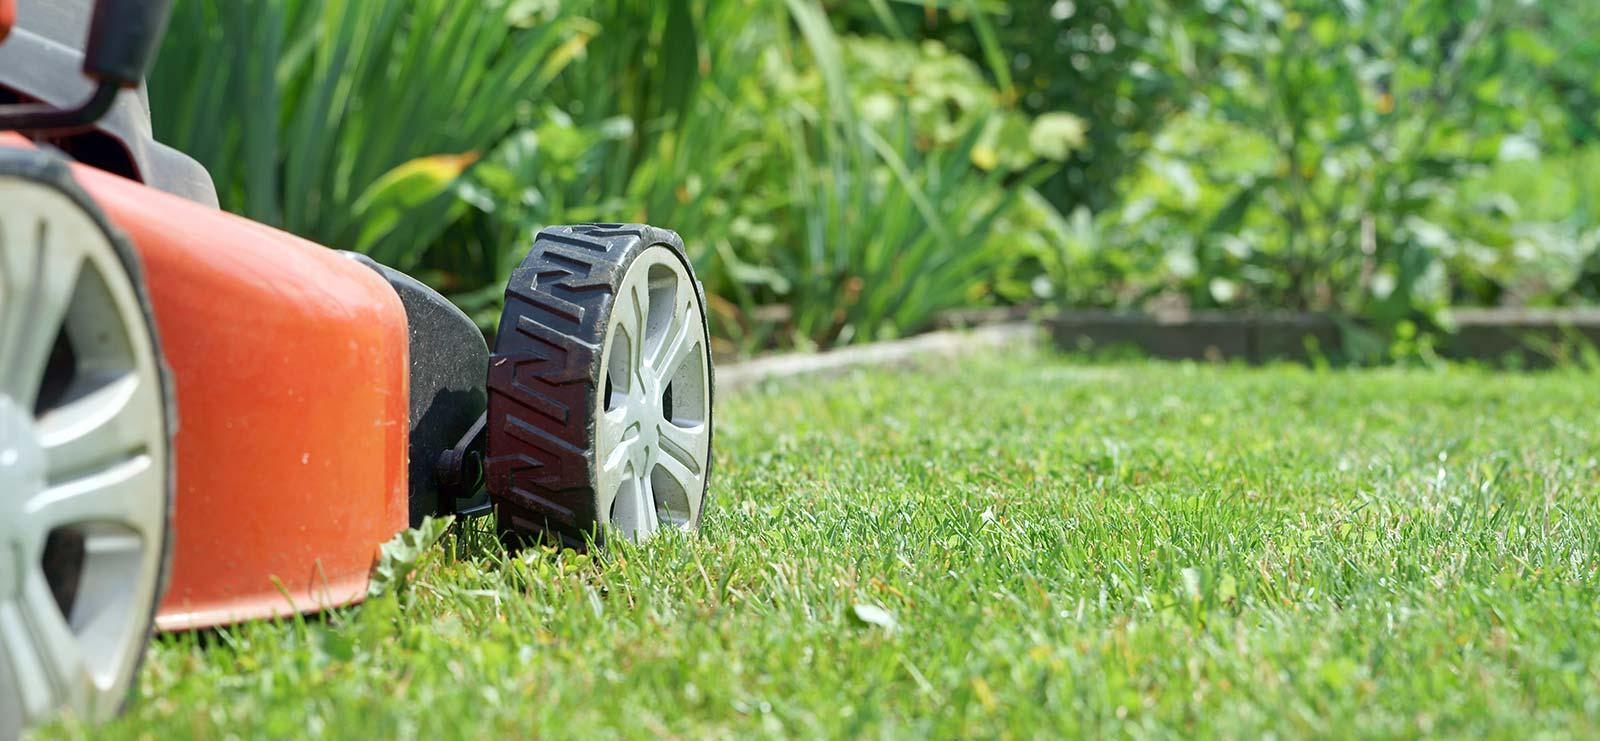 cedar rim nursery lawn care blog